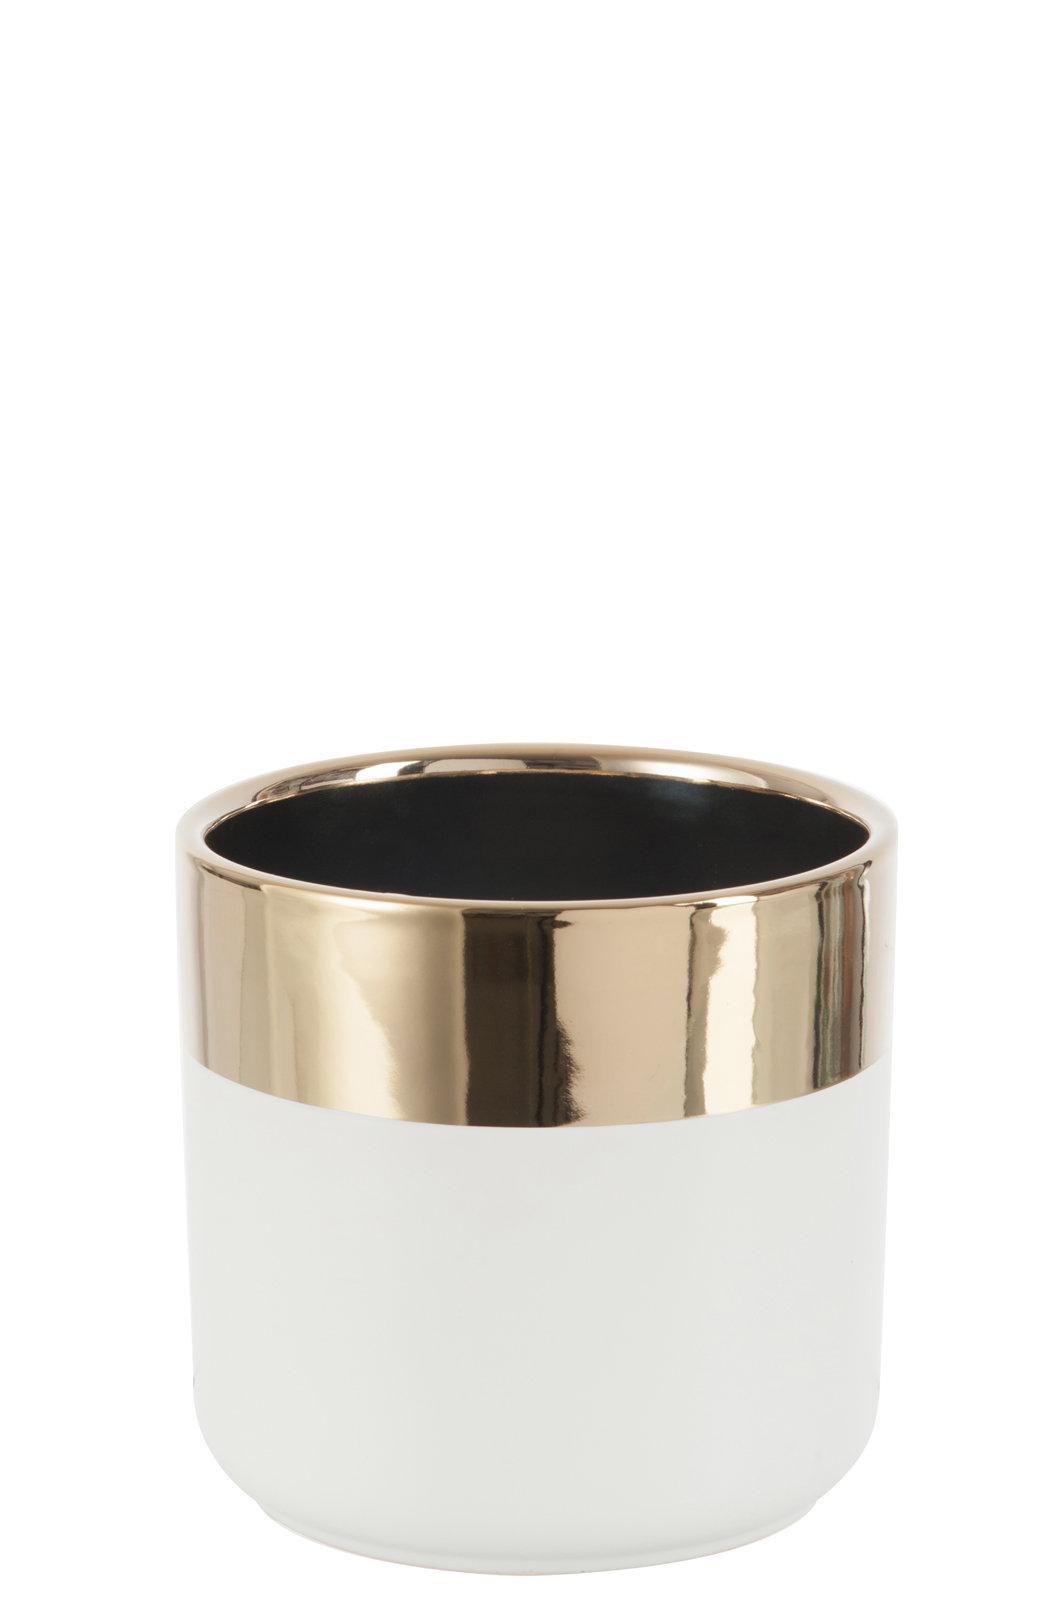 Donica 75656 CERAMIC/GOLD Ø13,5x12cm